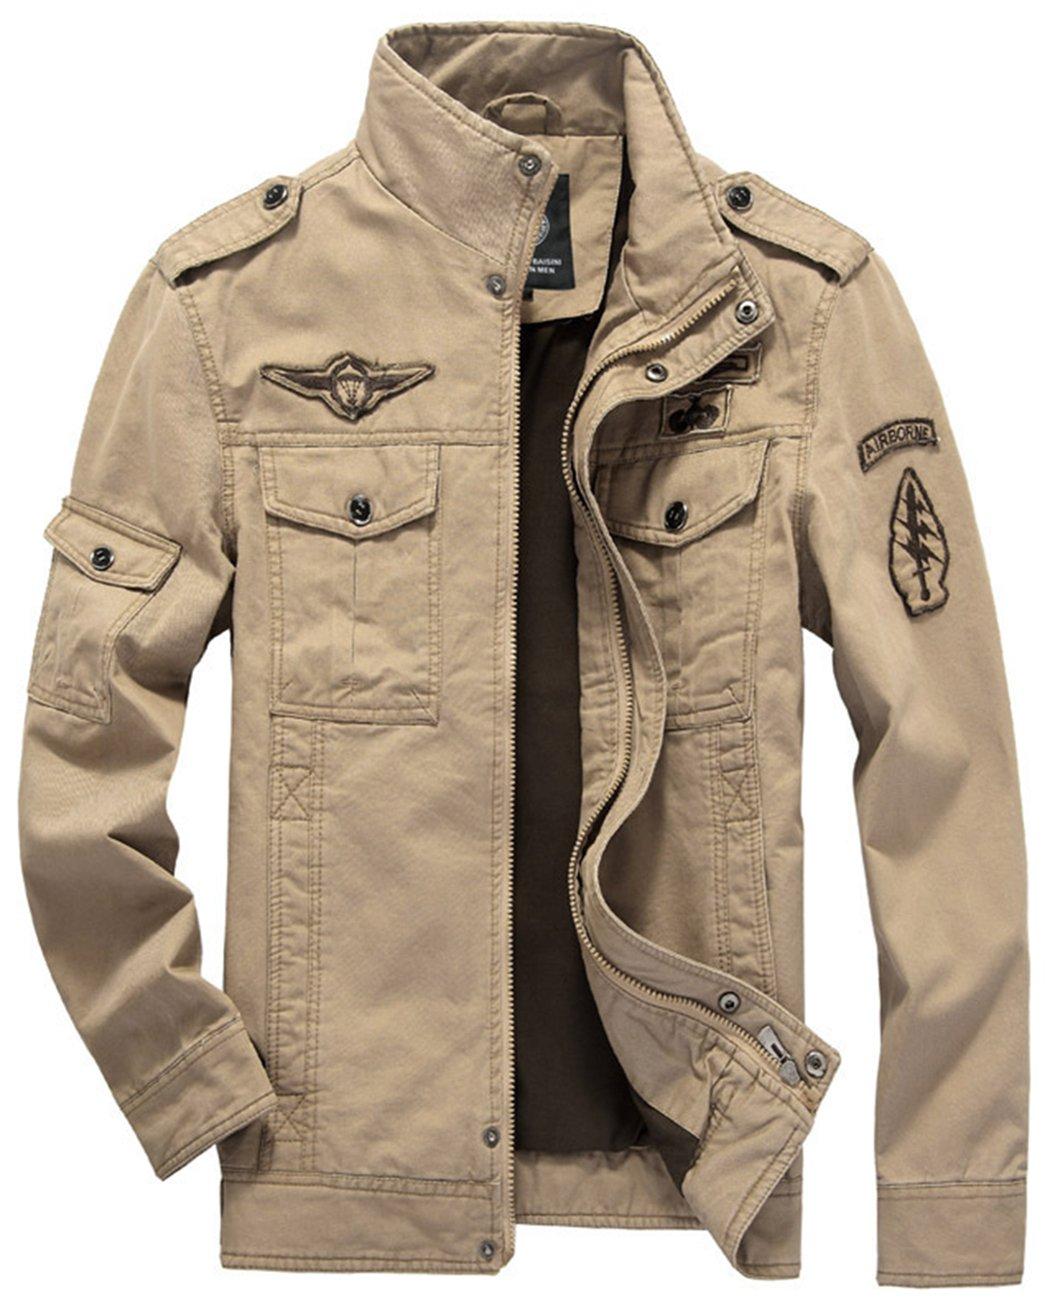 Sawadikaa Men's Cotton Lightweight Military Casual Jacket Windbreaker Wind Trench Coat Bomber Jacket Khaki Large